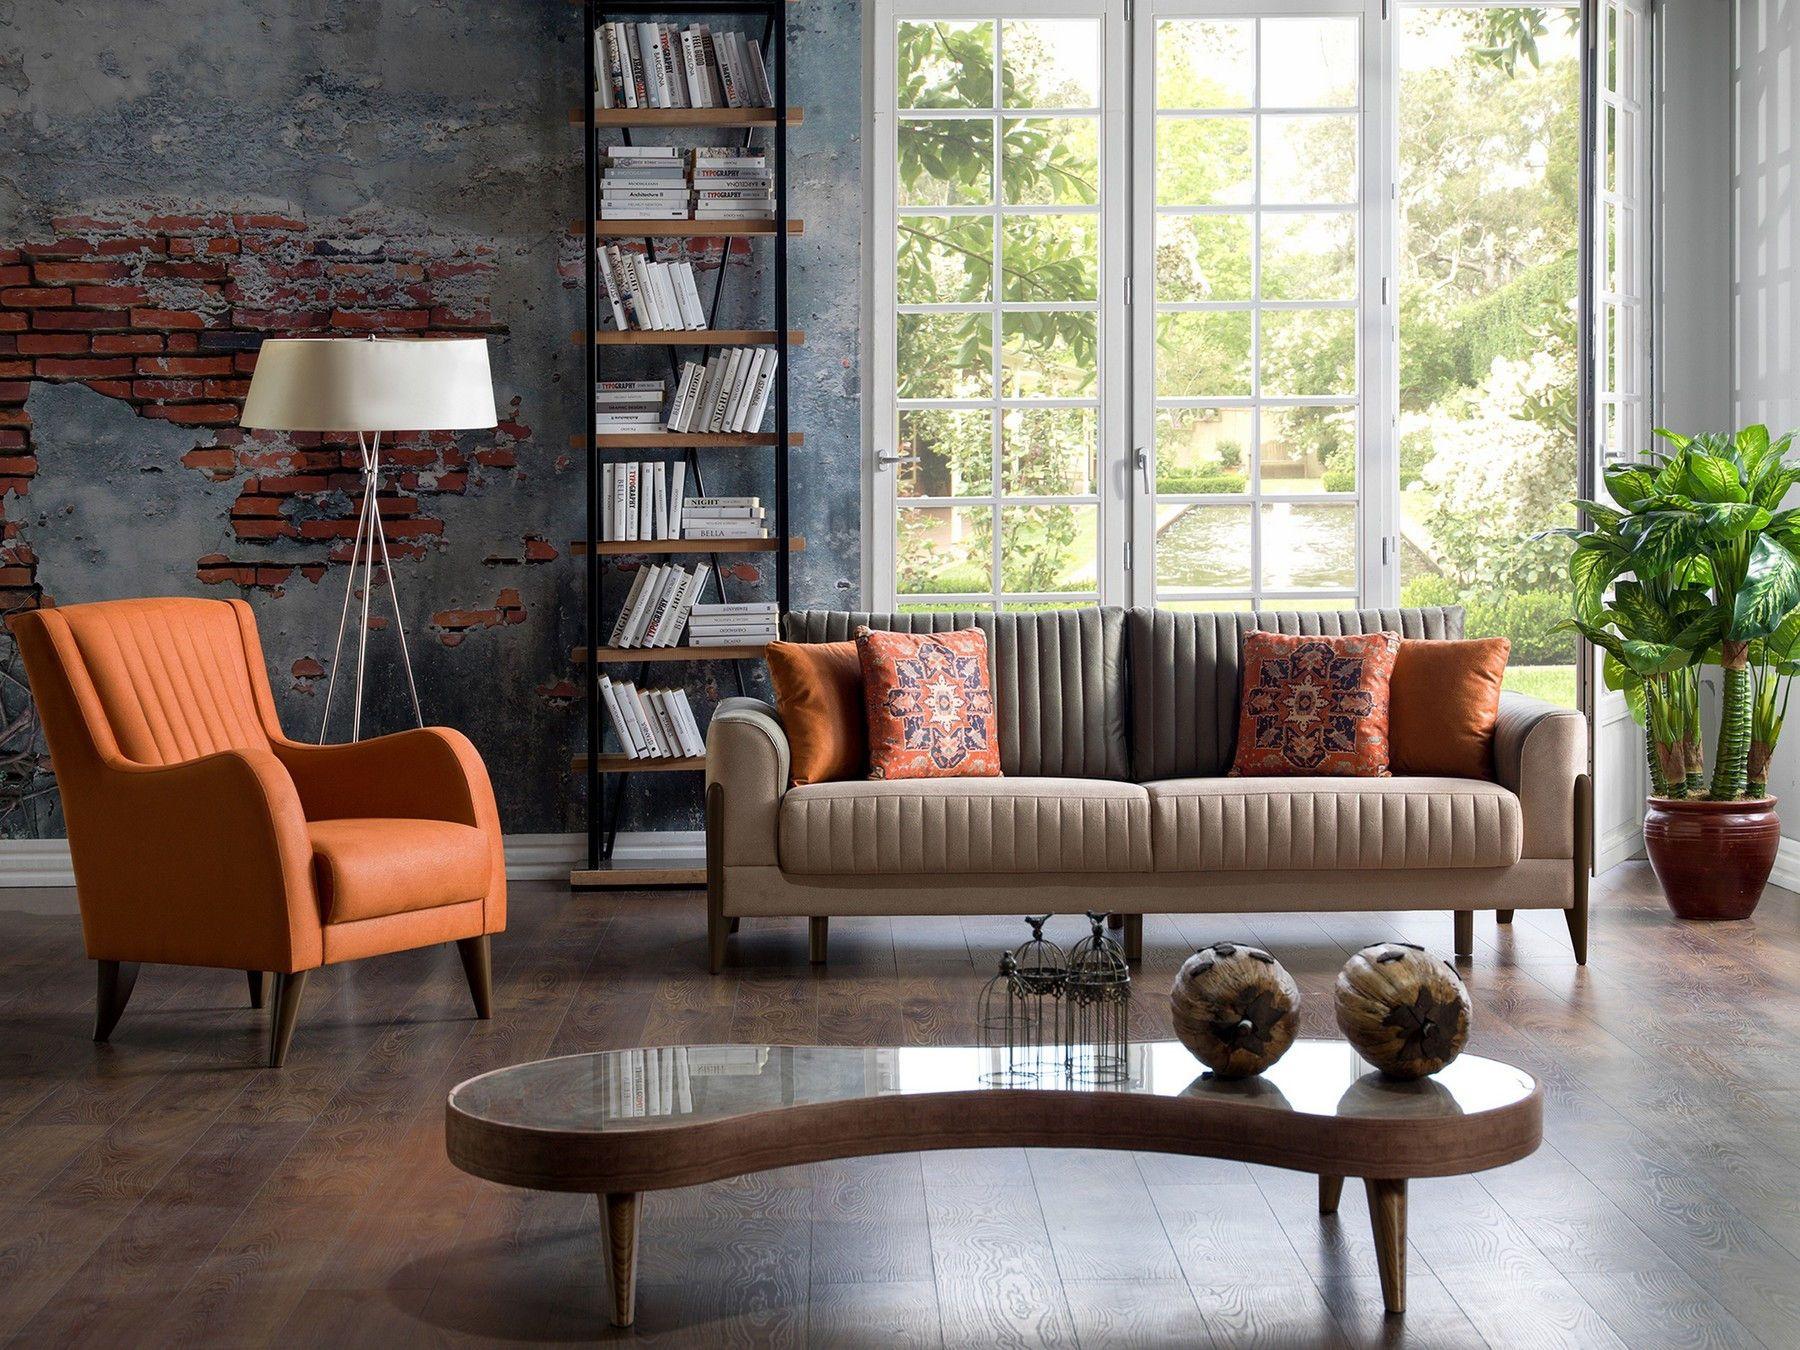 Istikbal Piero Contemporary Upholstery Brown Orange Sofa Living Room Sofa Orange Sofa Furniture #orange #sofa #in #living #room